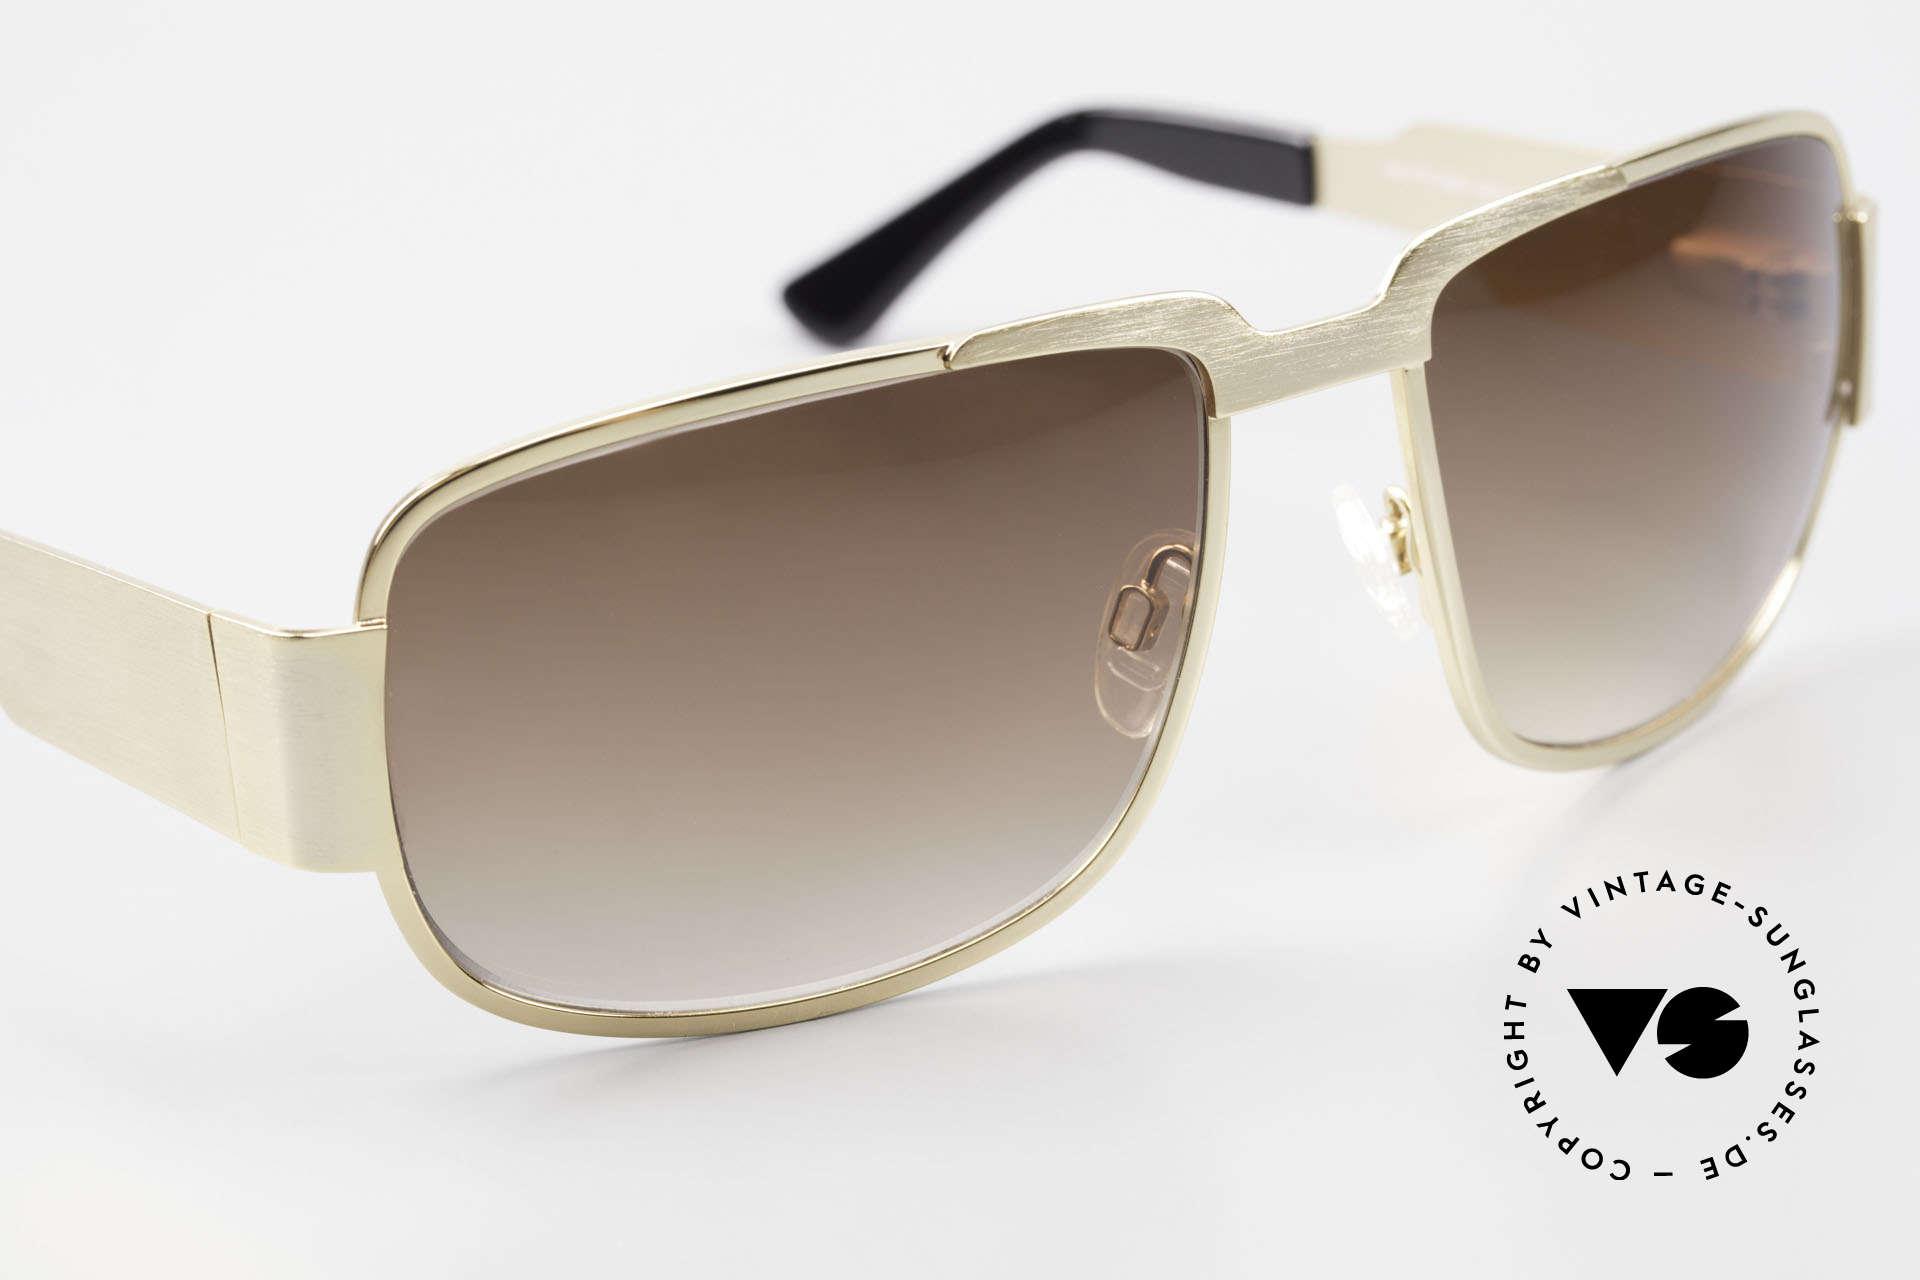 Neostyle Nautic 2 Brad Pitt Tarantino Sunglasses, we offer these XXL sunglasses, unworn & with original case, Made for Men